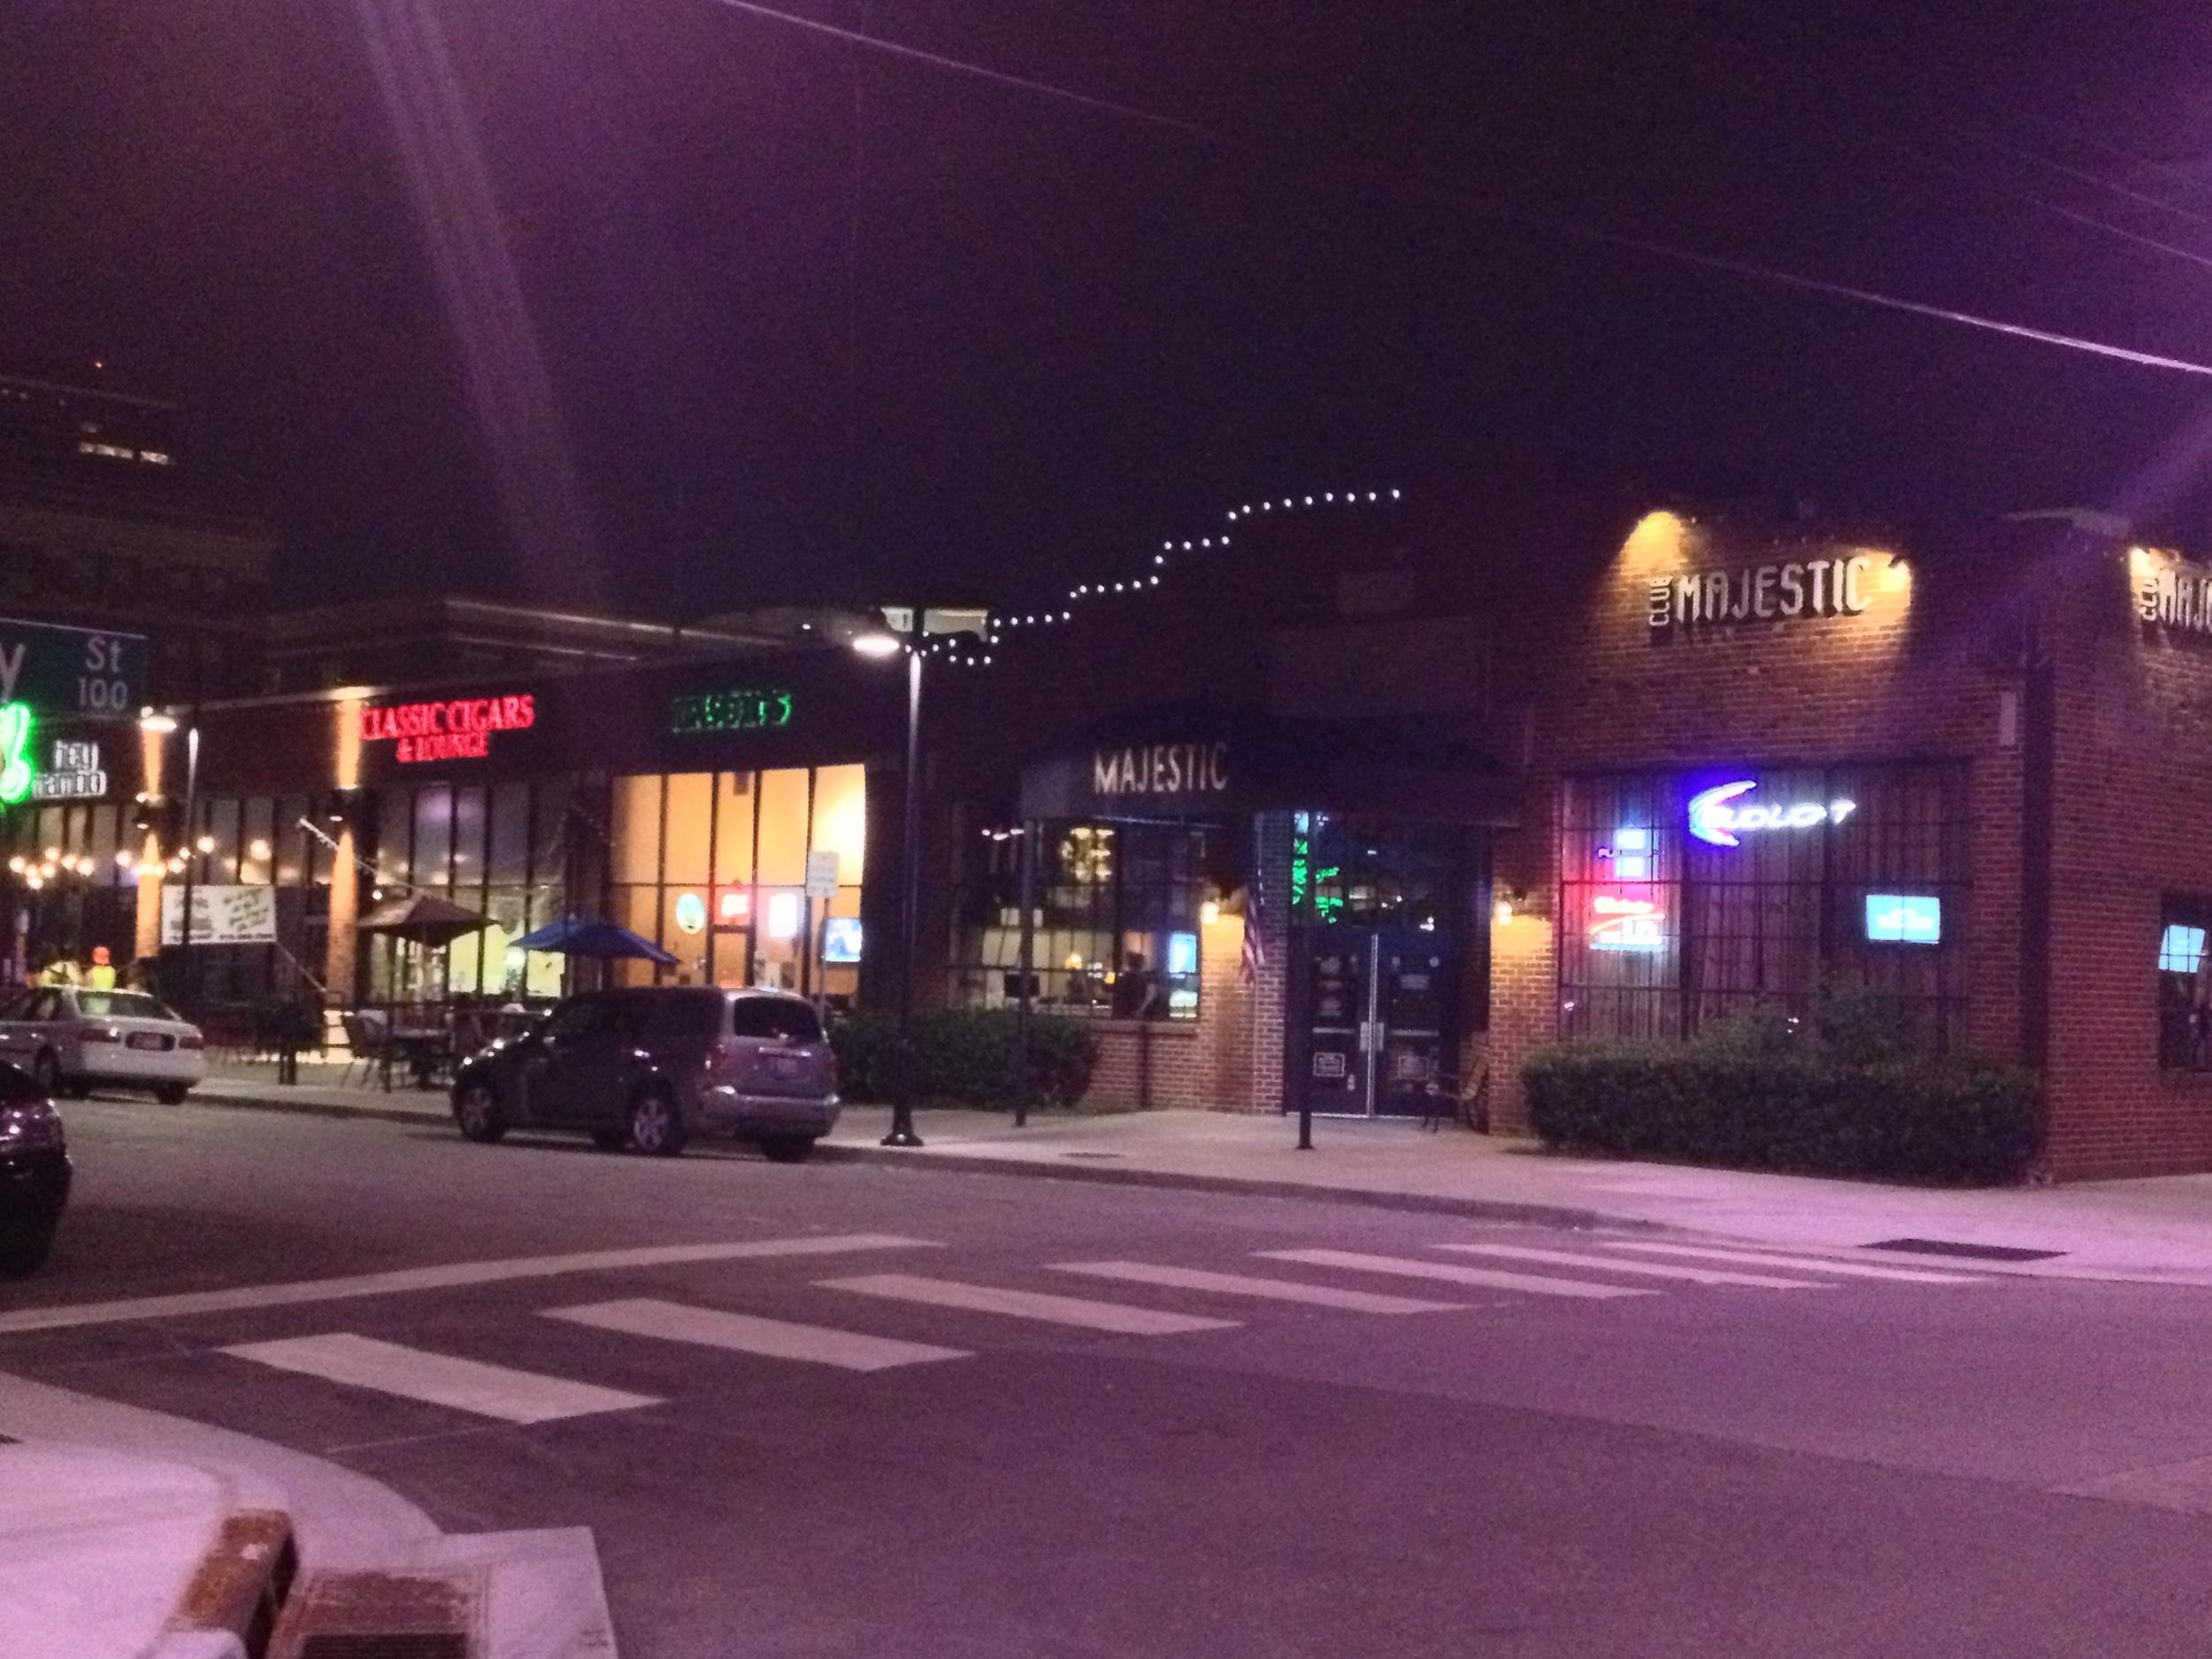 Club Majestic in Tulsa, Oklahoma